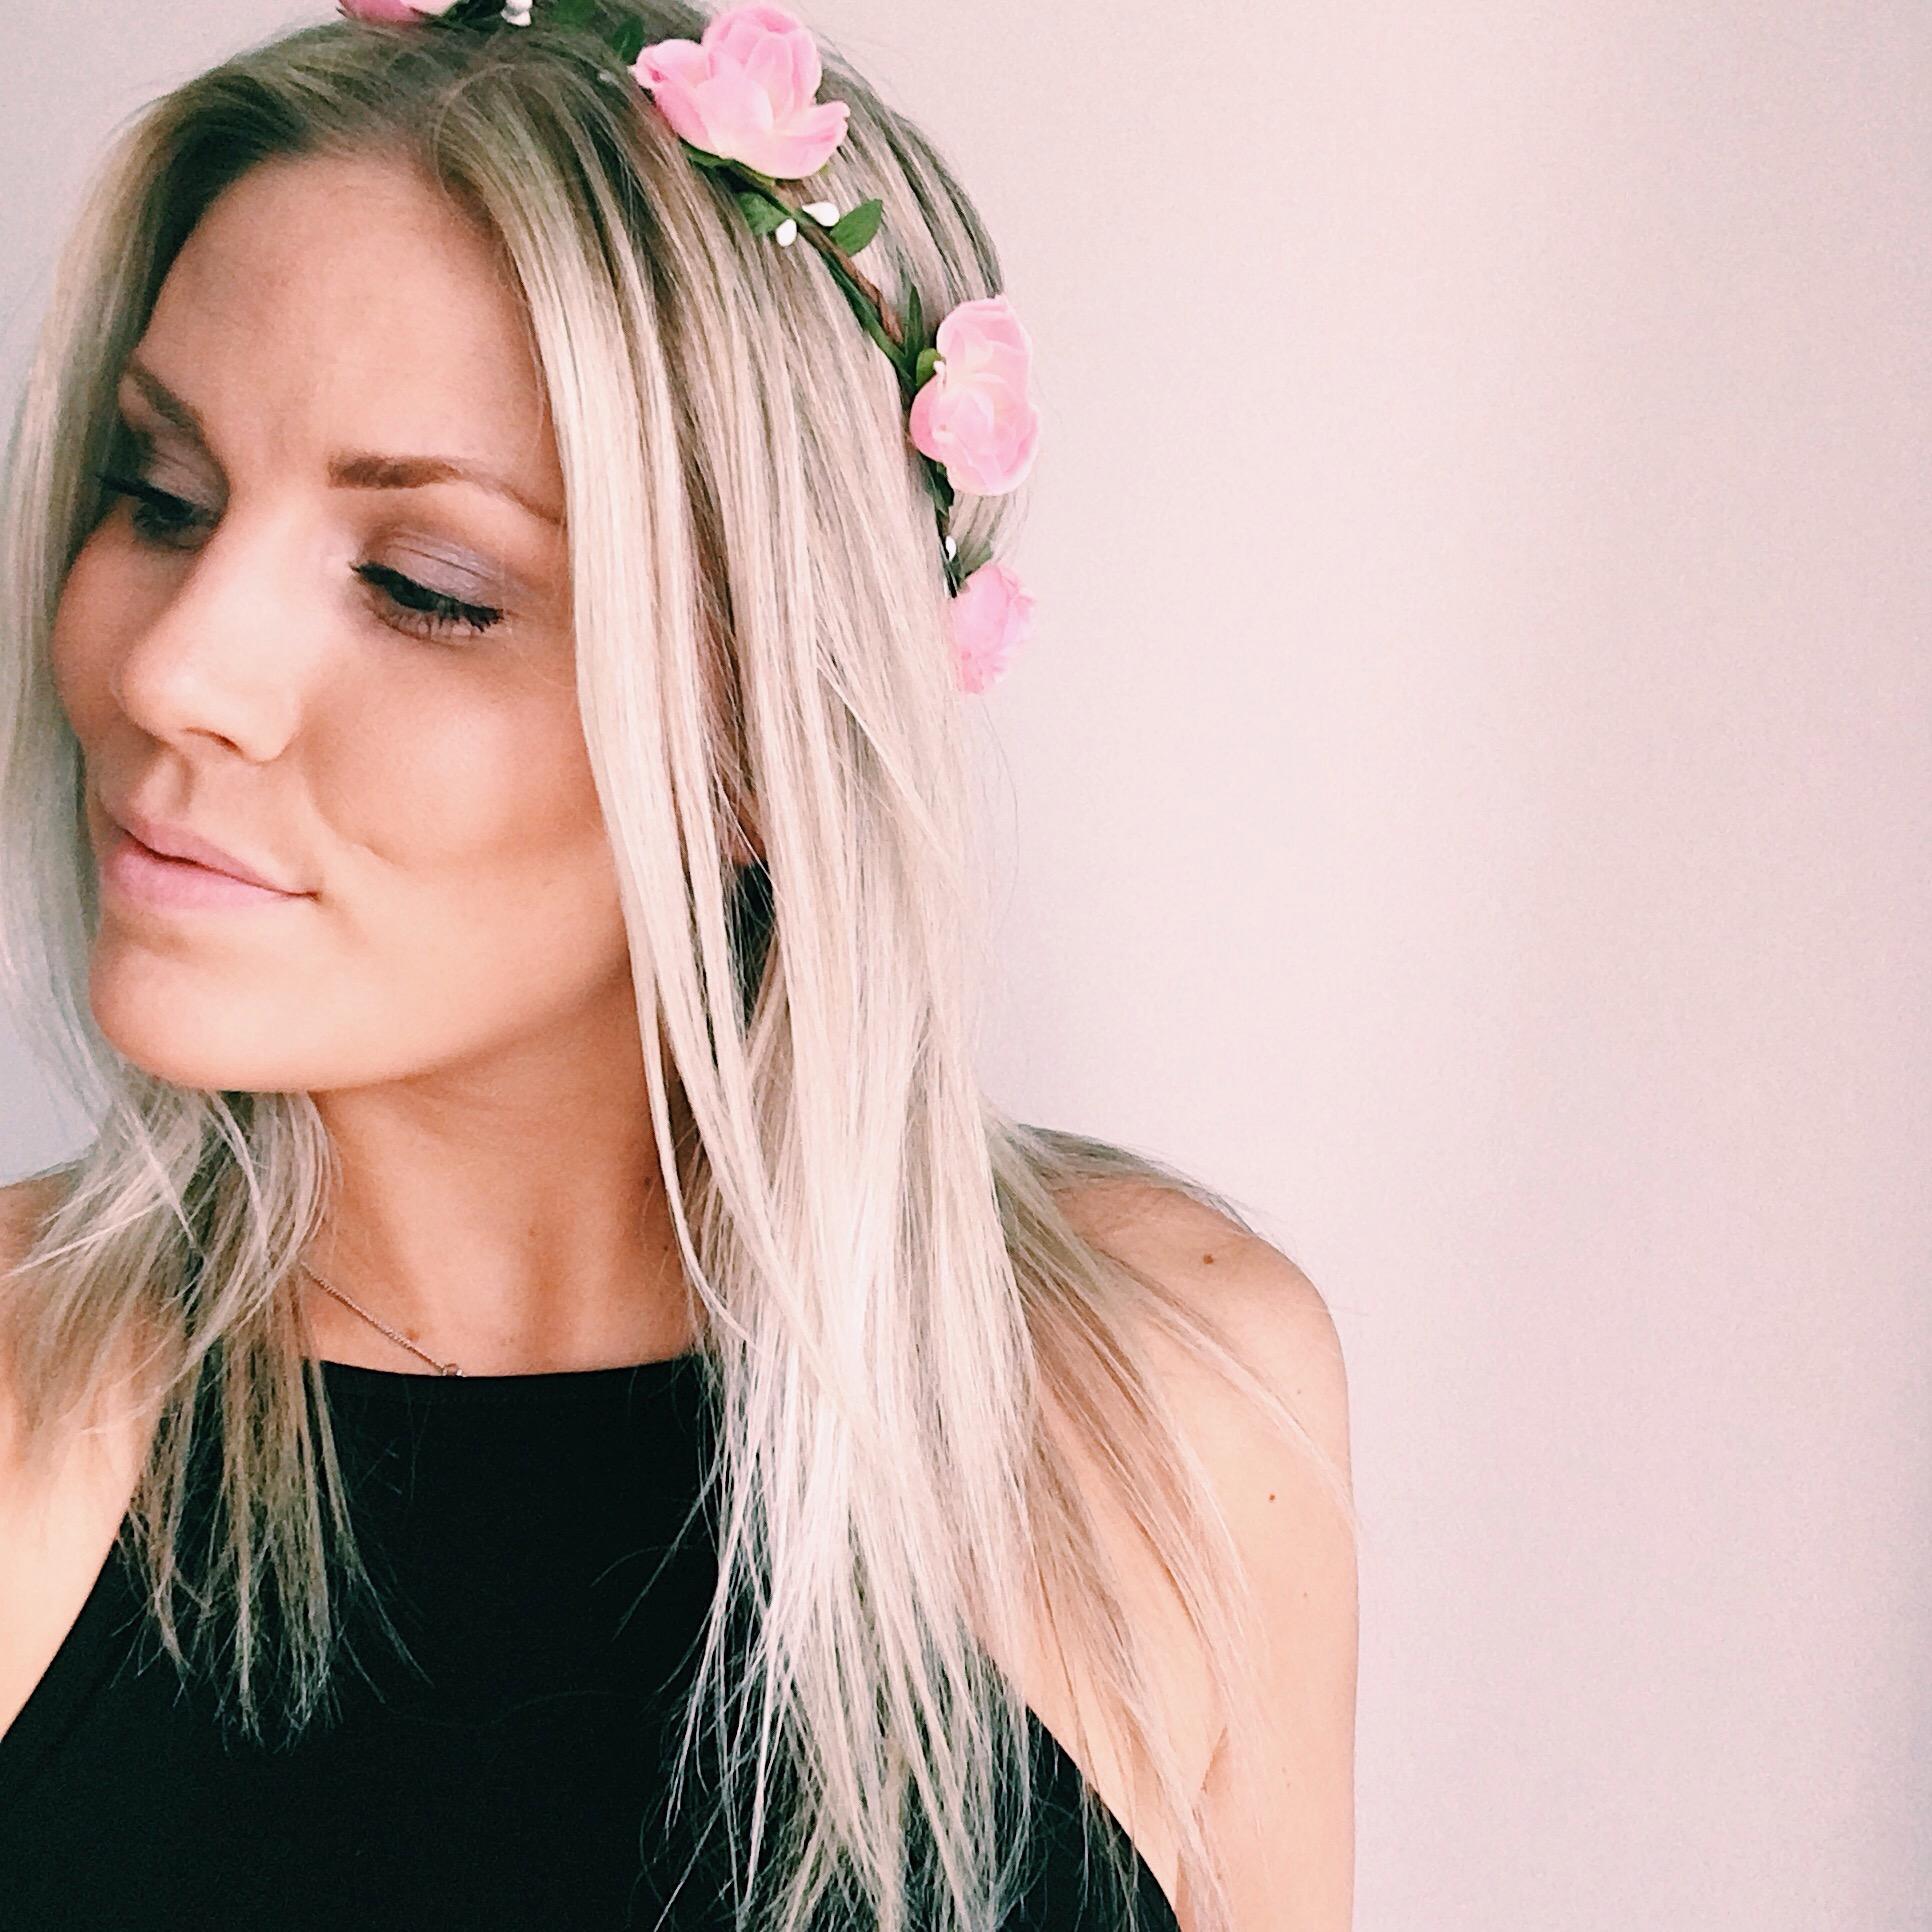 Endless summer - Maria Åkerberg